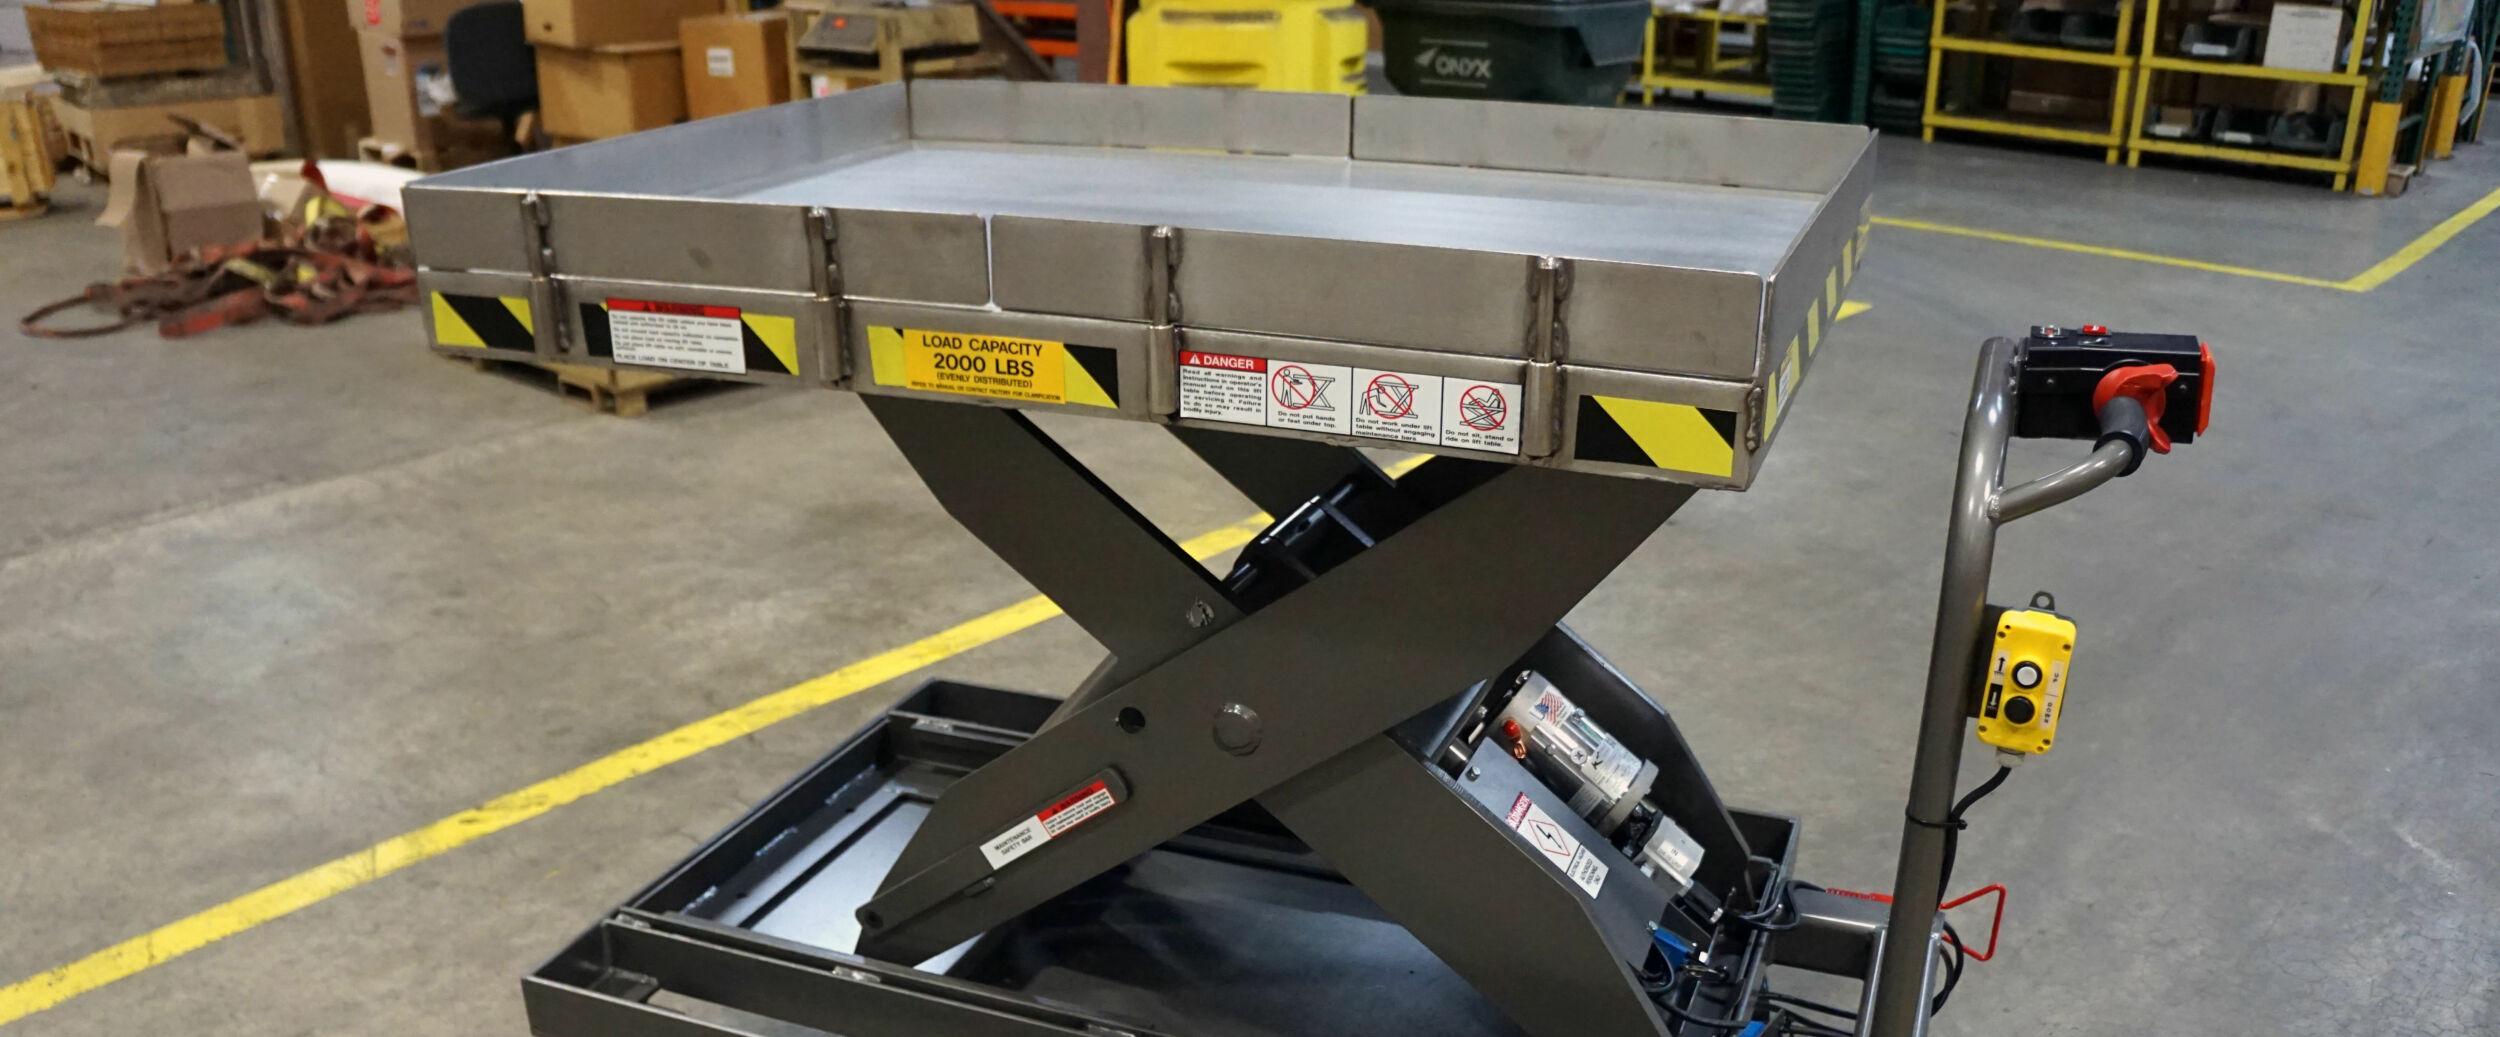 Custom Motorized Scissor Lift For Medical Device Manufacturer